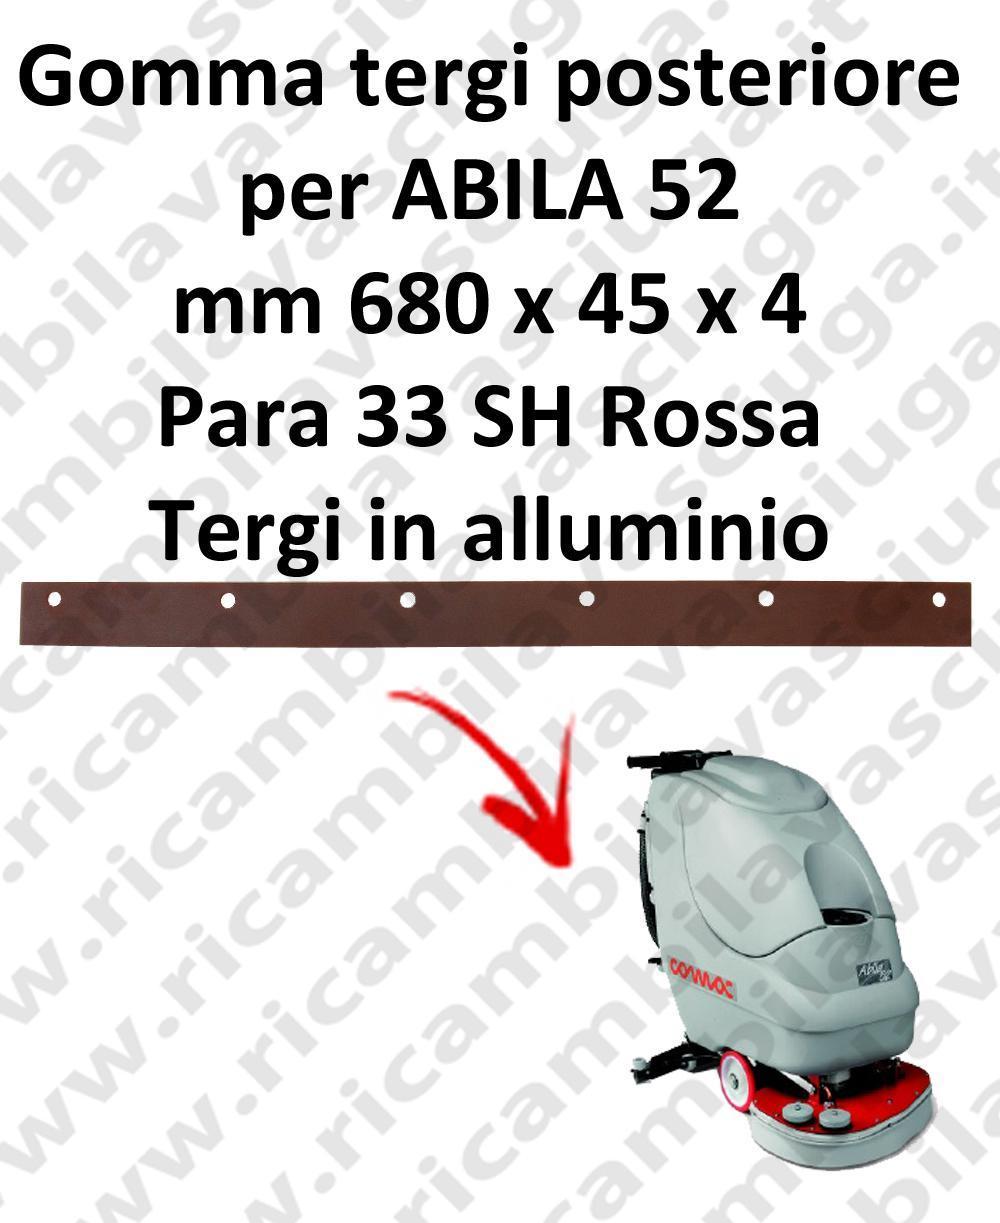 ABILA 52 Hinten sauglippen für scheuersaugmaschinen COMAC